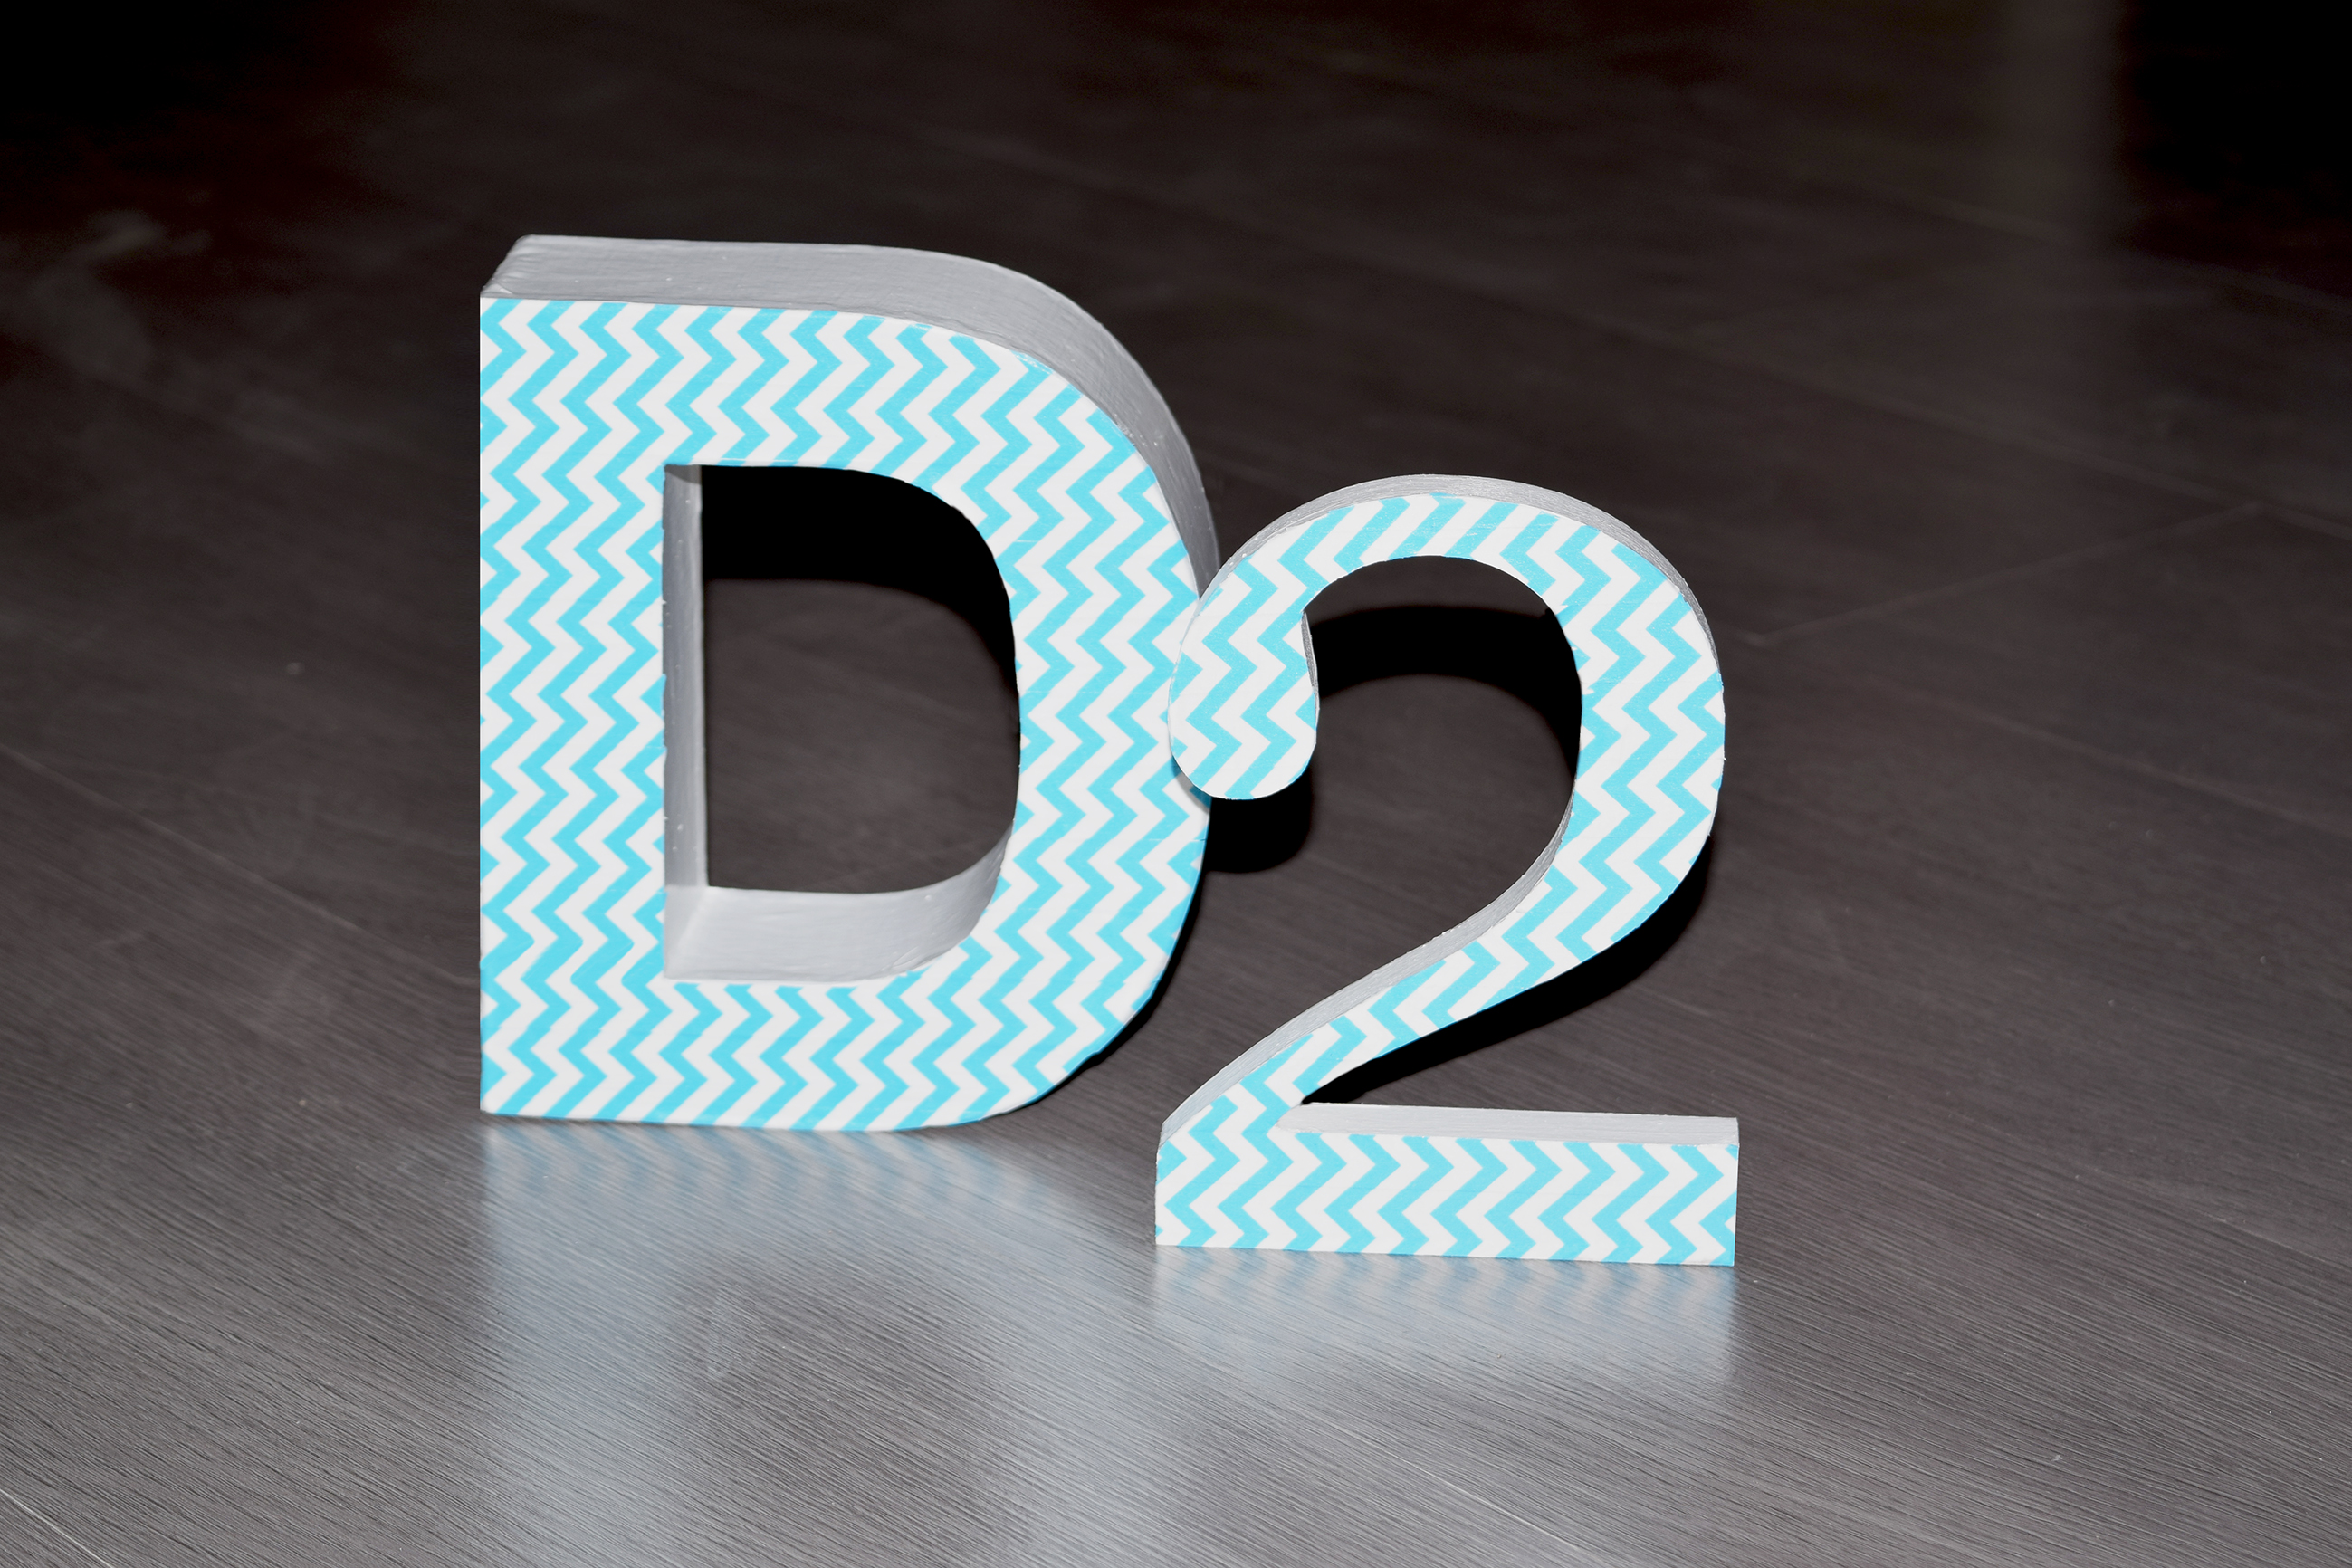 inicialesD2